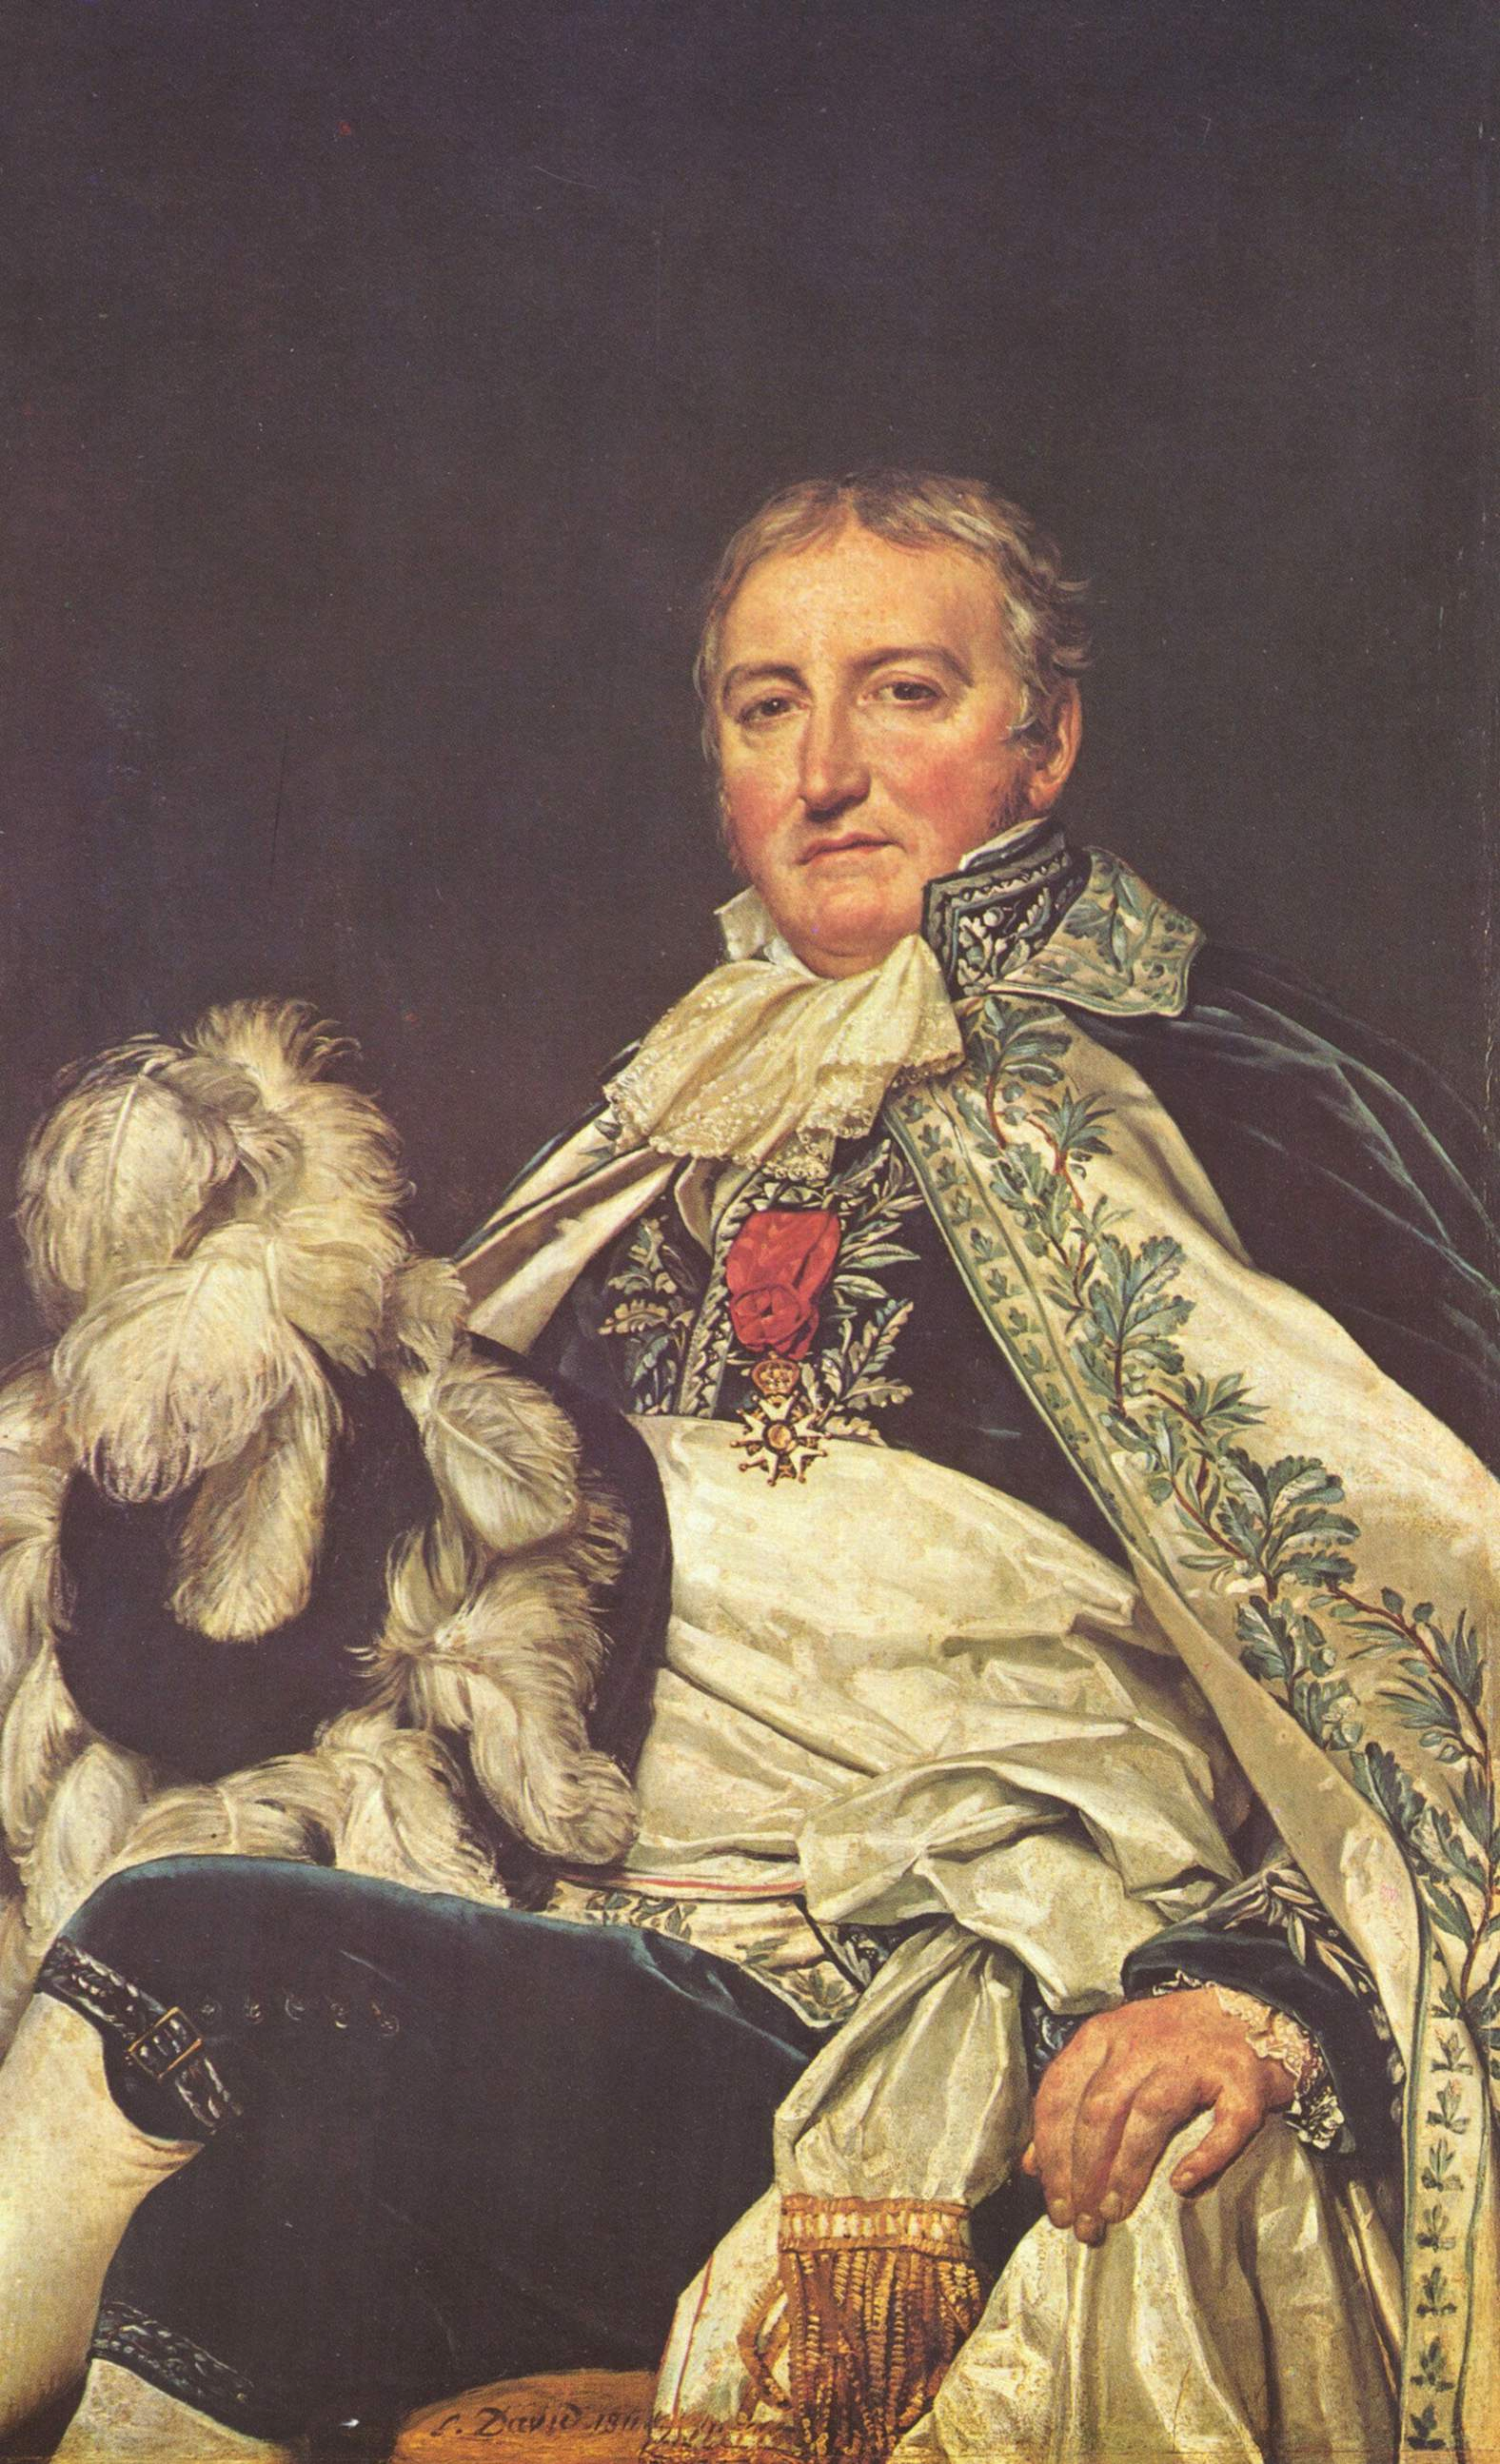 Портрет графа Франсуа де Нант, Жак - Луи Давид